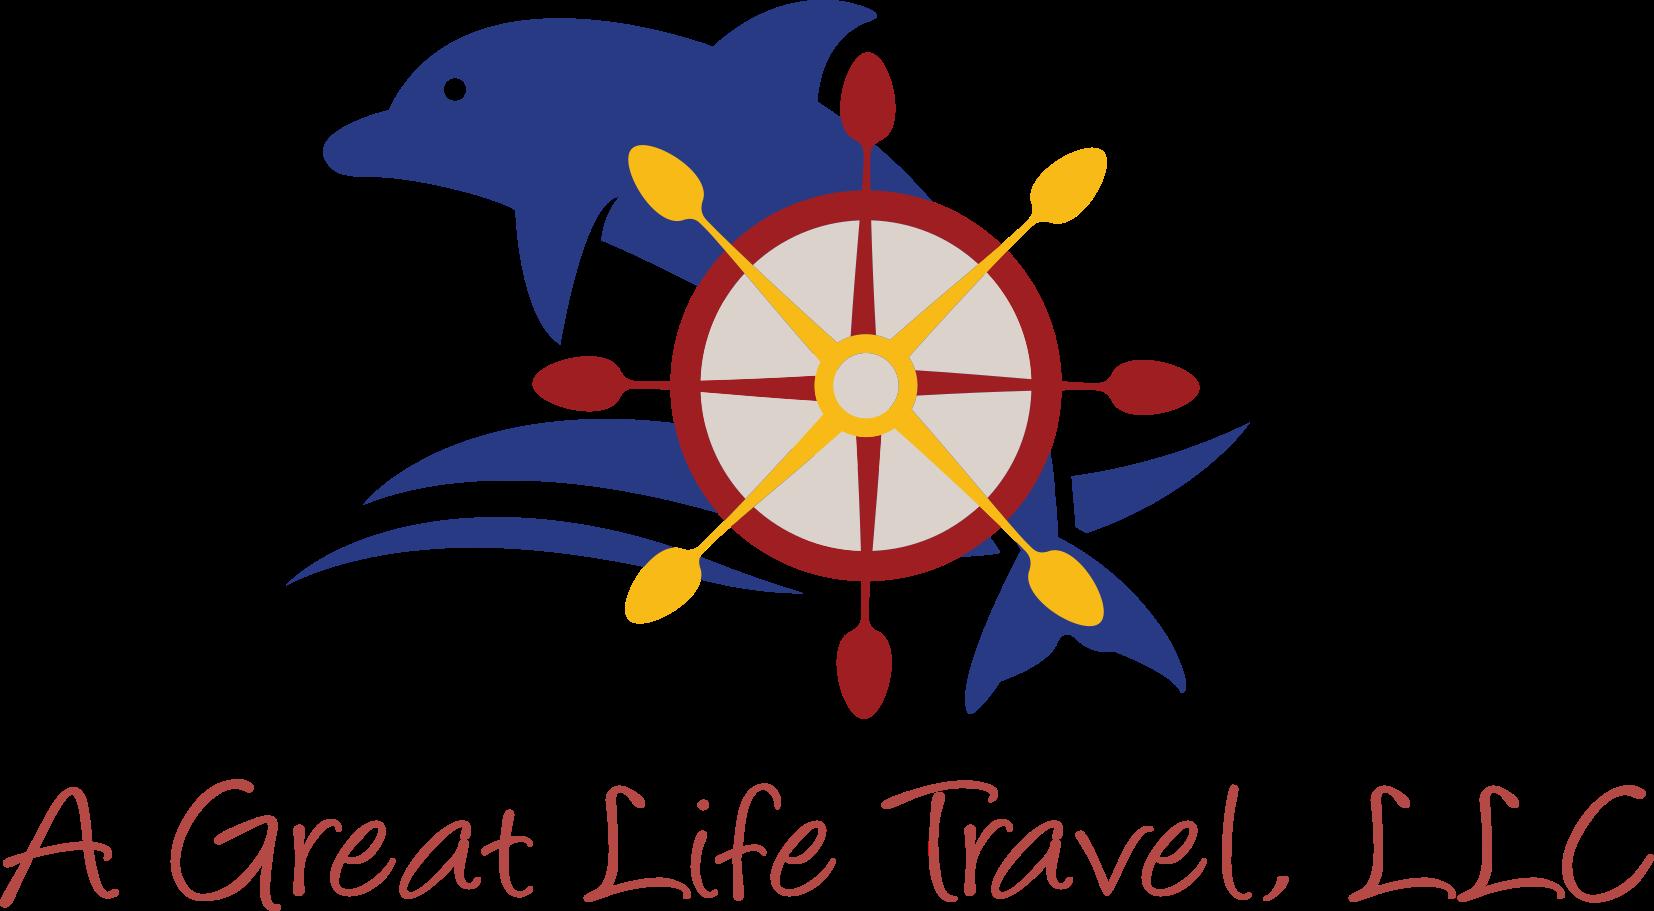 A Great Life Travel, LLC logo